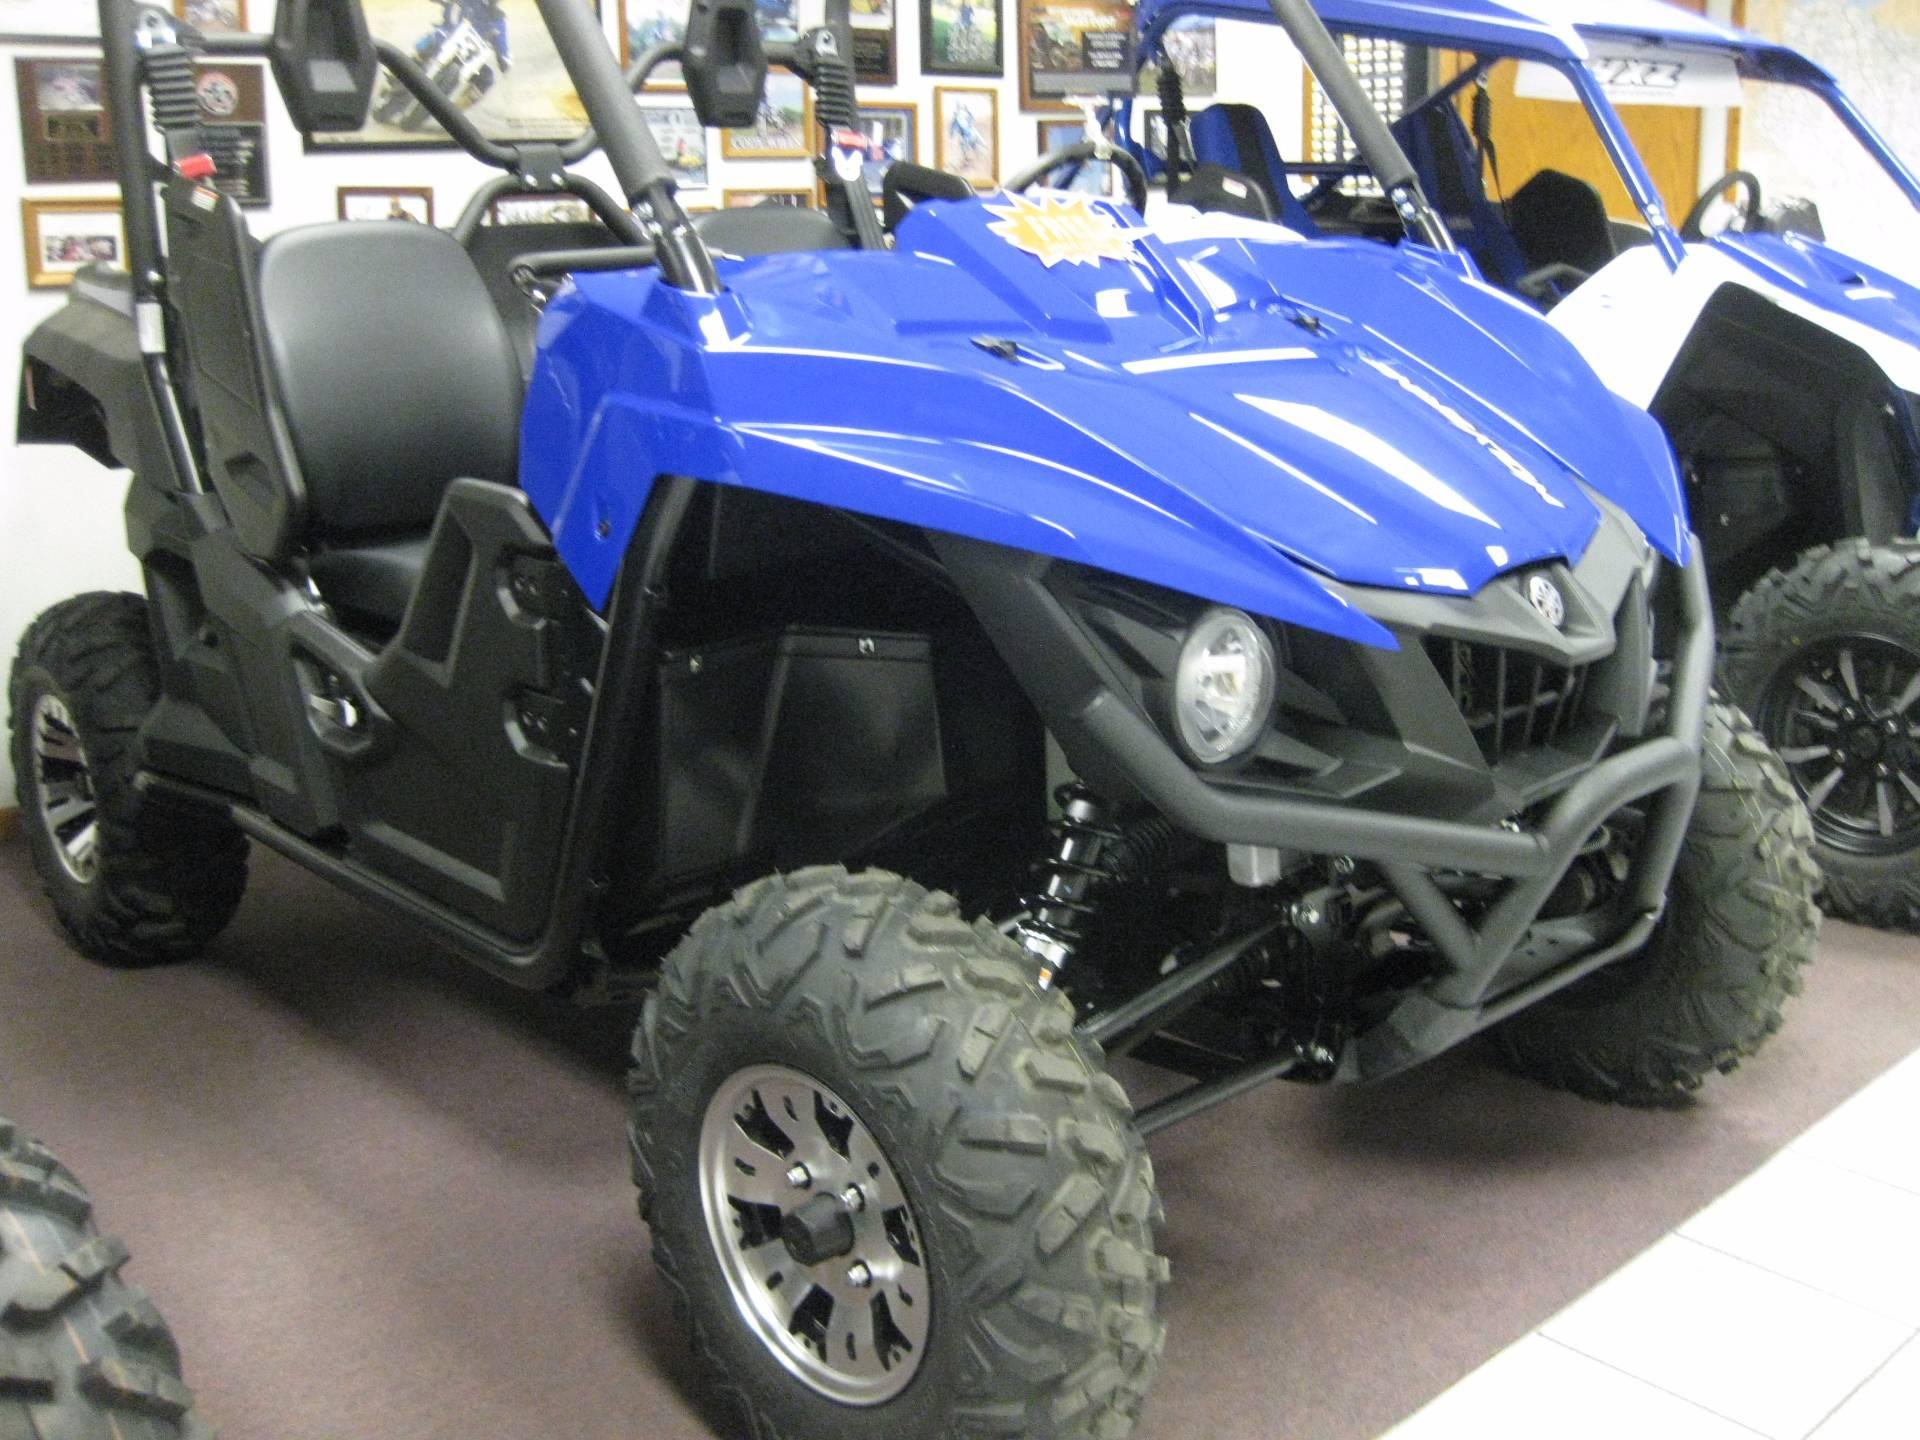 2017 Yamaha Wolverine EPS in Wisconsin Rapids, Wisconsin